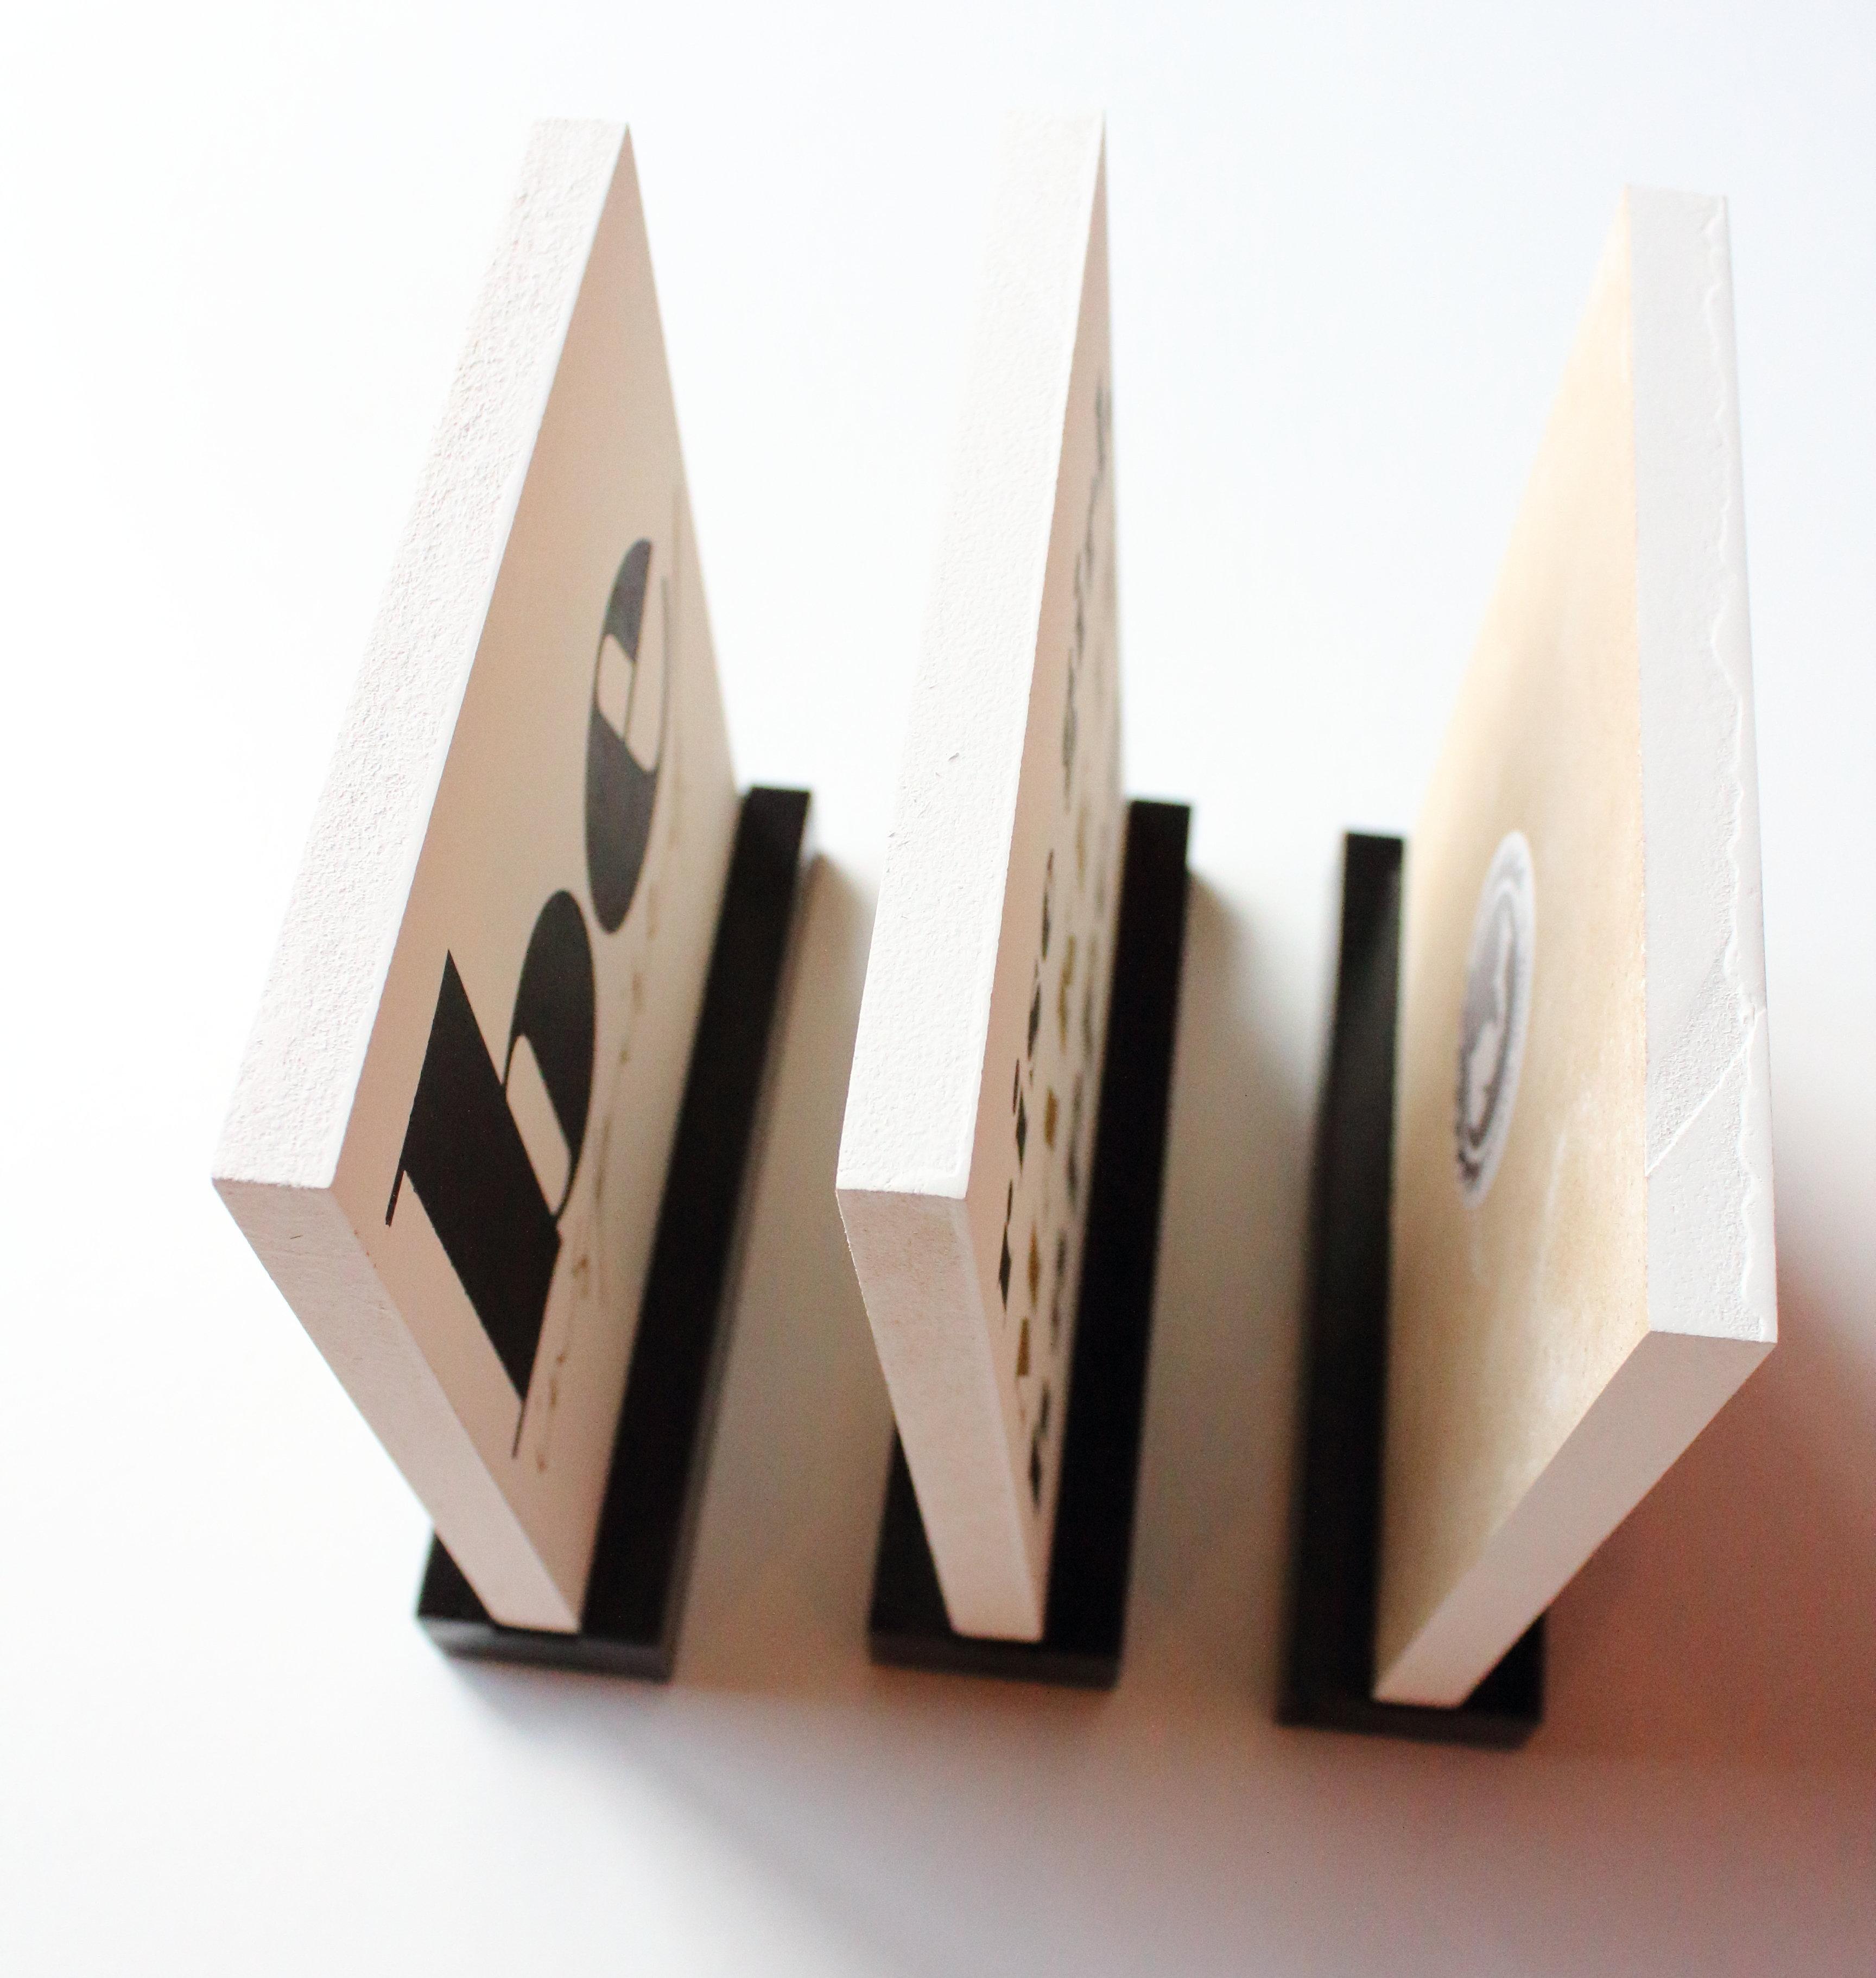 6x6 Mini Desktop Signs The Wood Garage